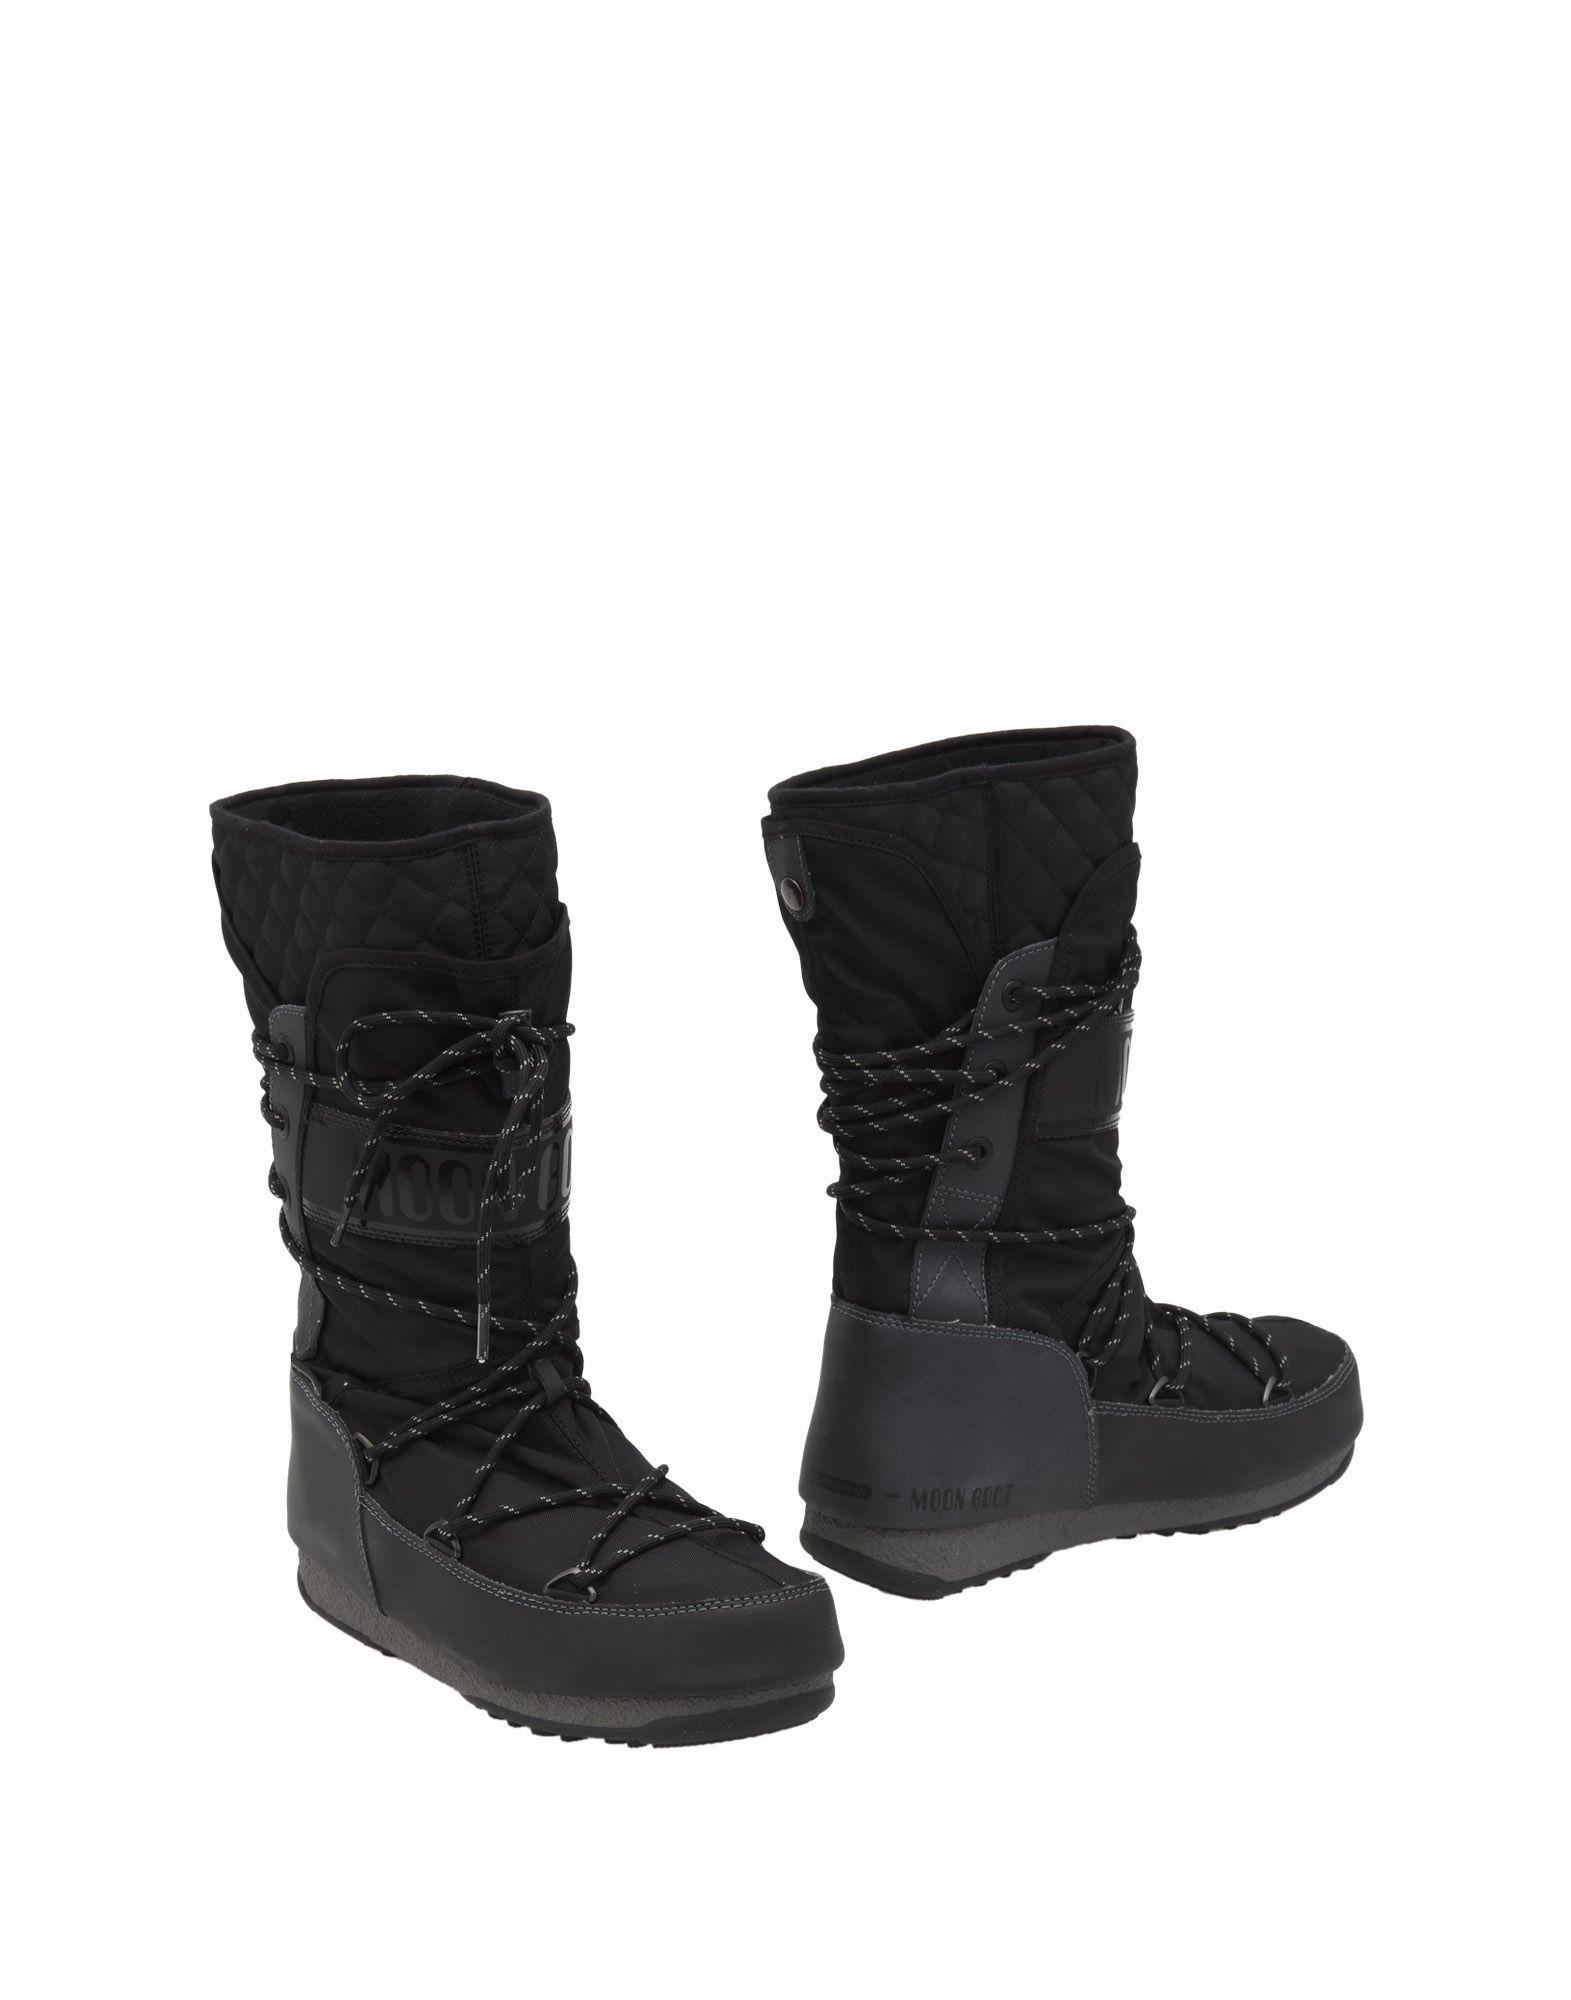 Stivali Moon Boot Monaco Flip Wp - Donna - 11443150GX